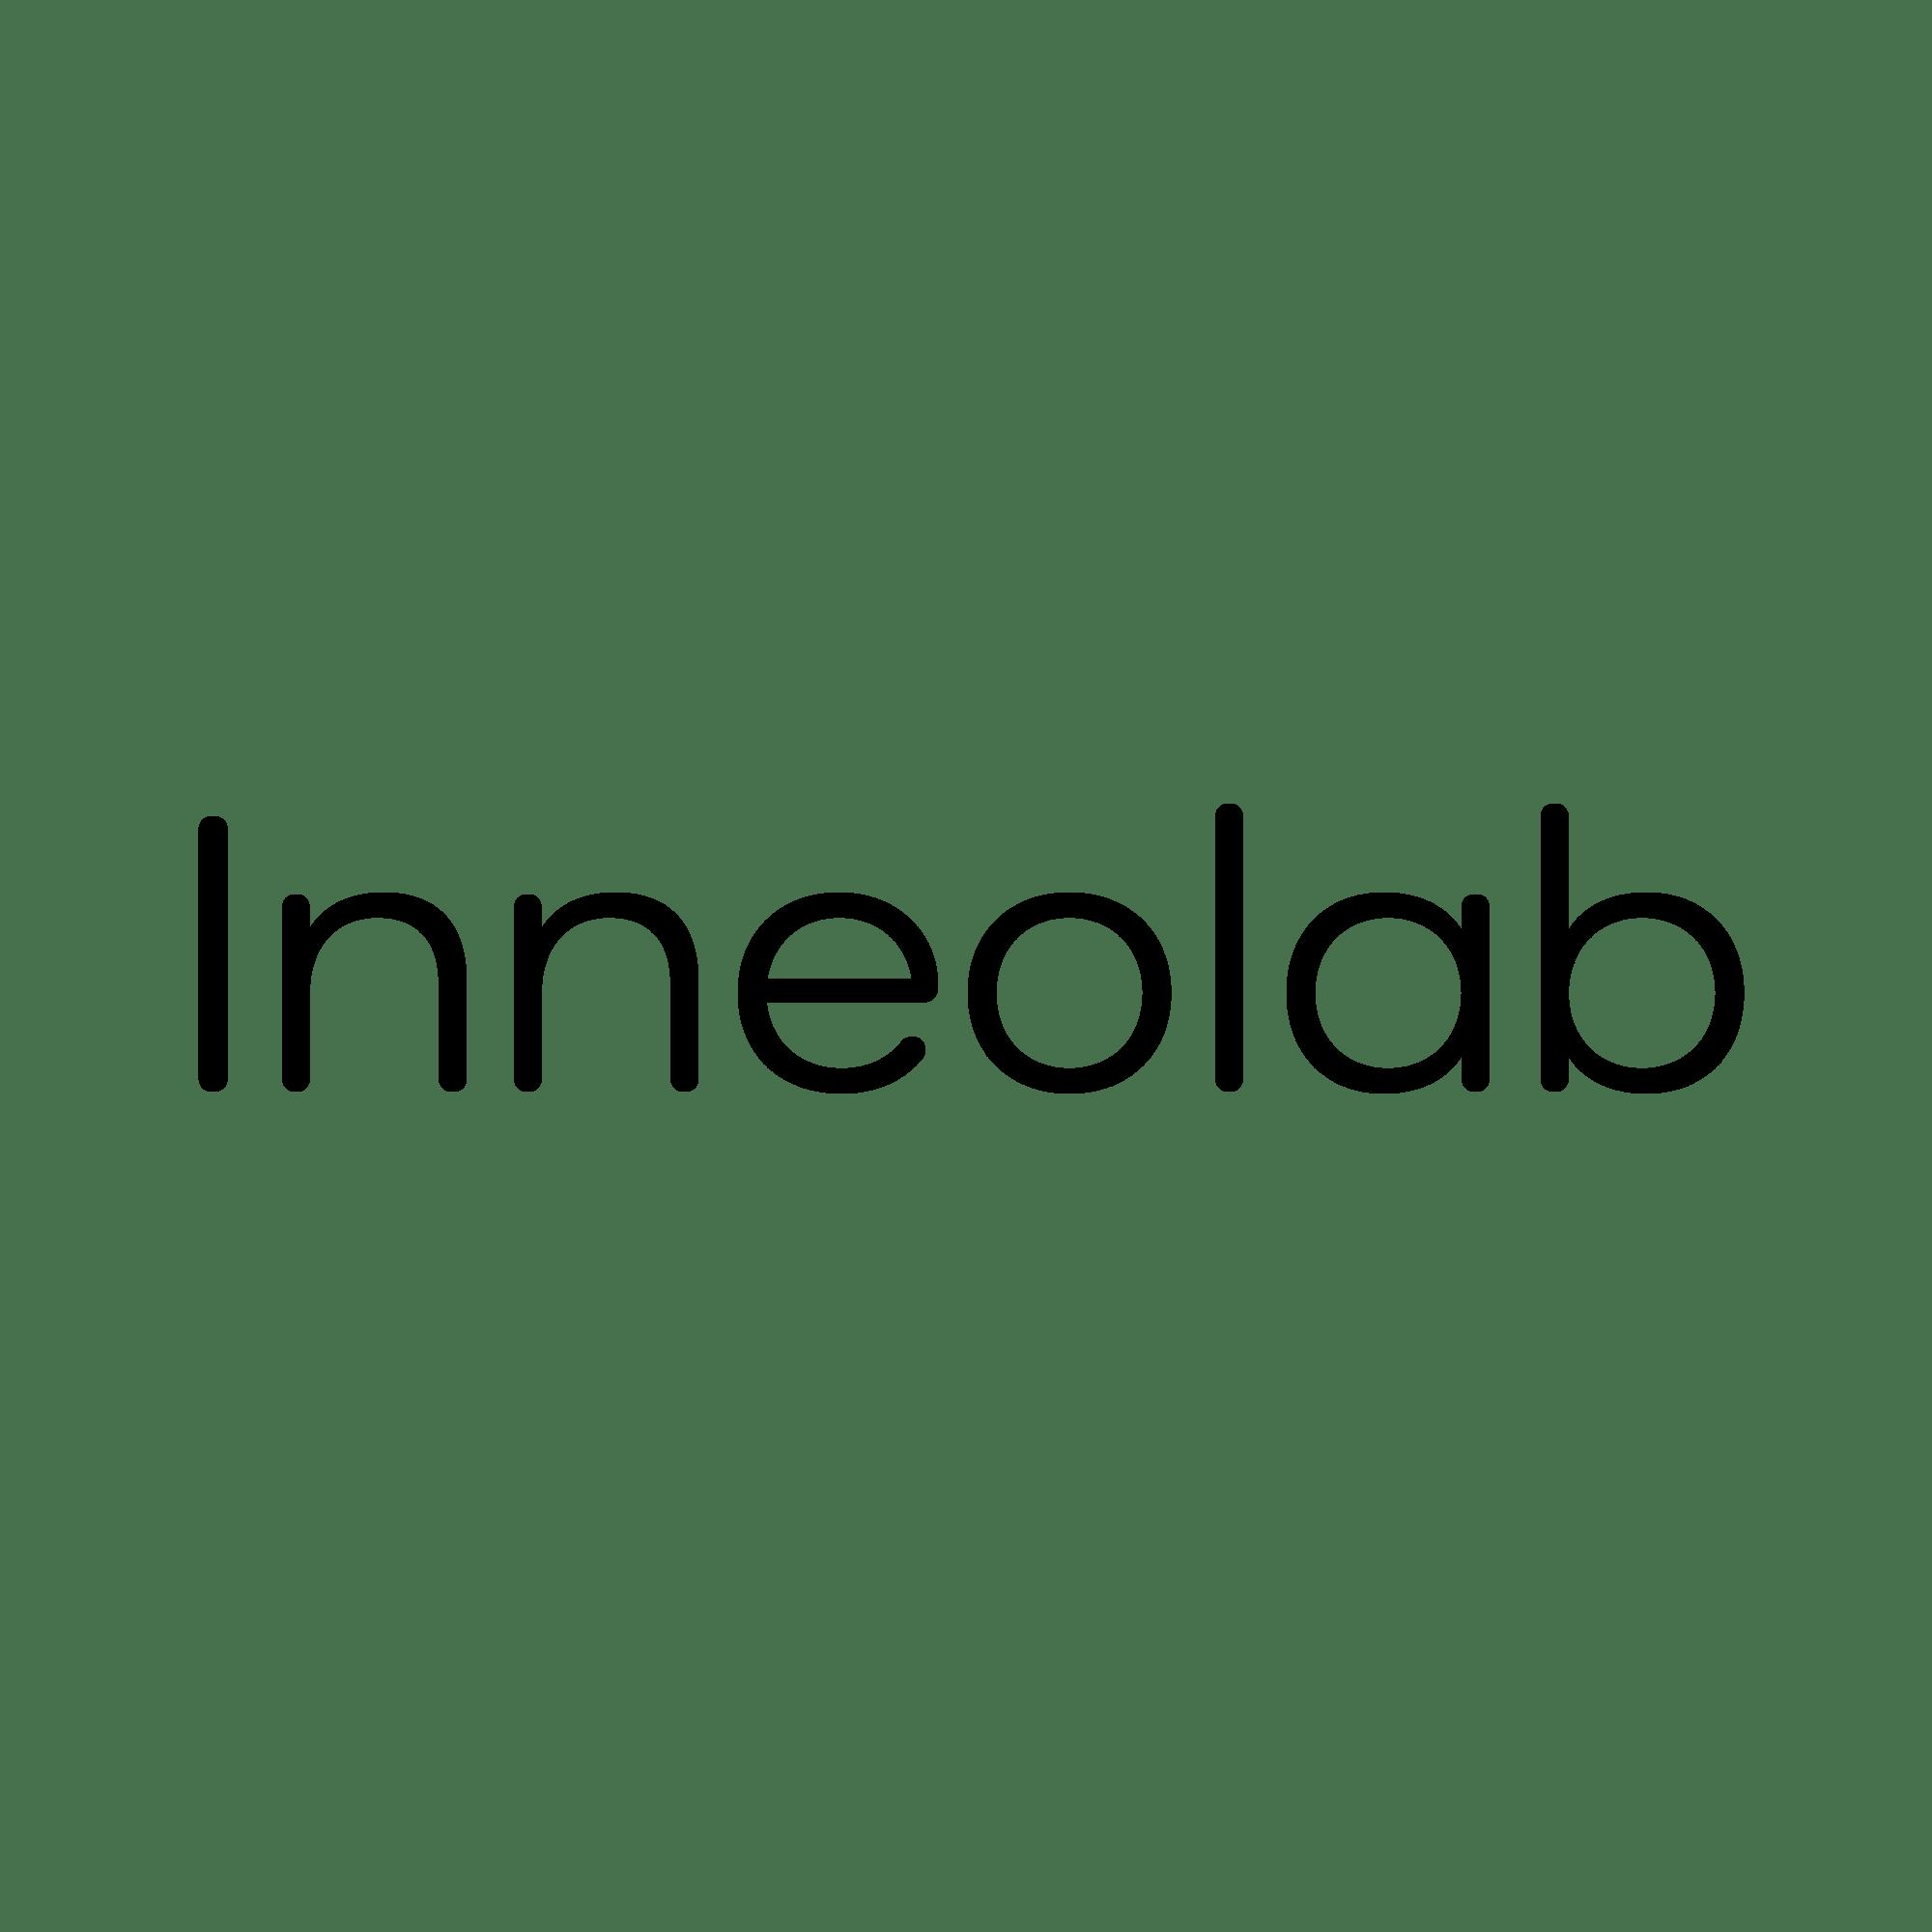 Inneolab logoe